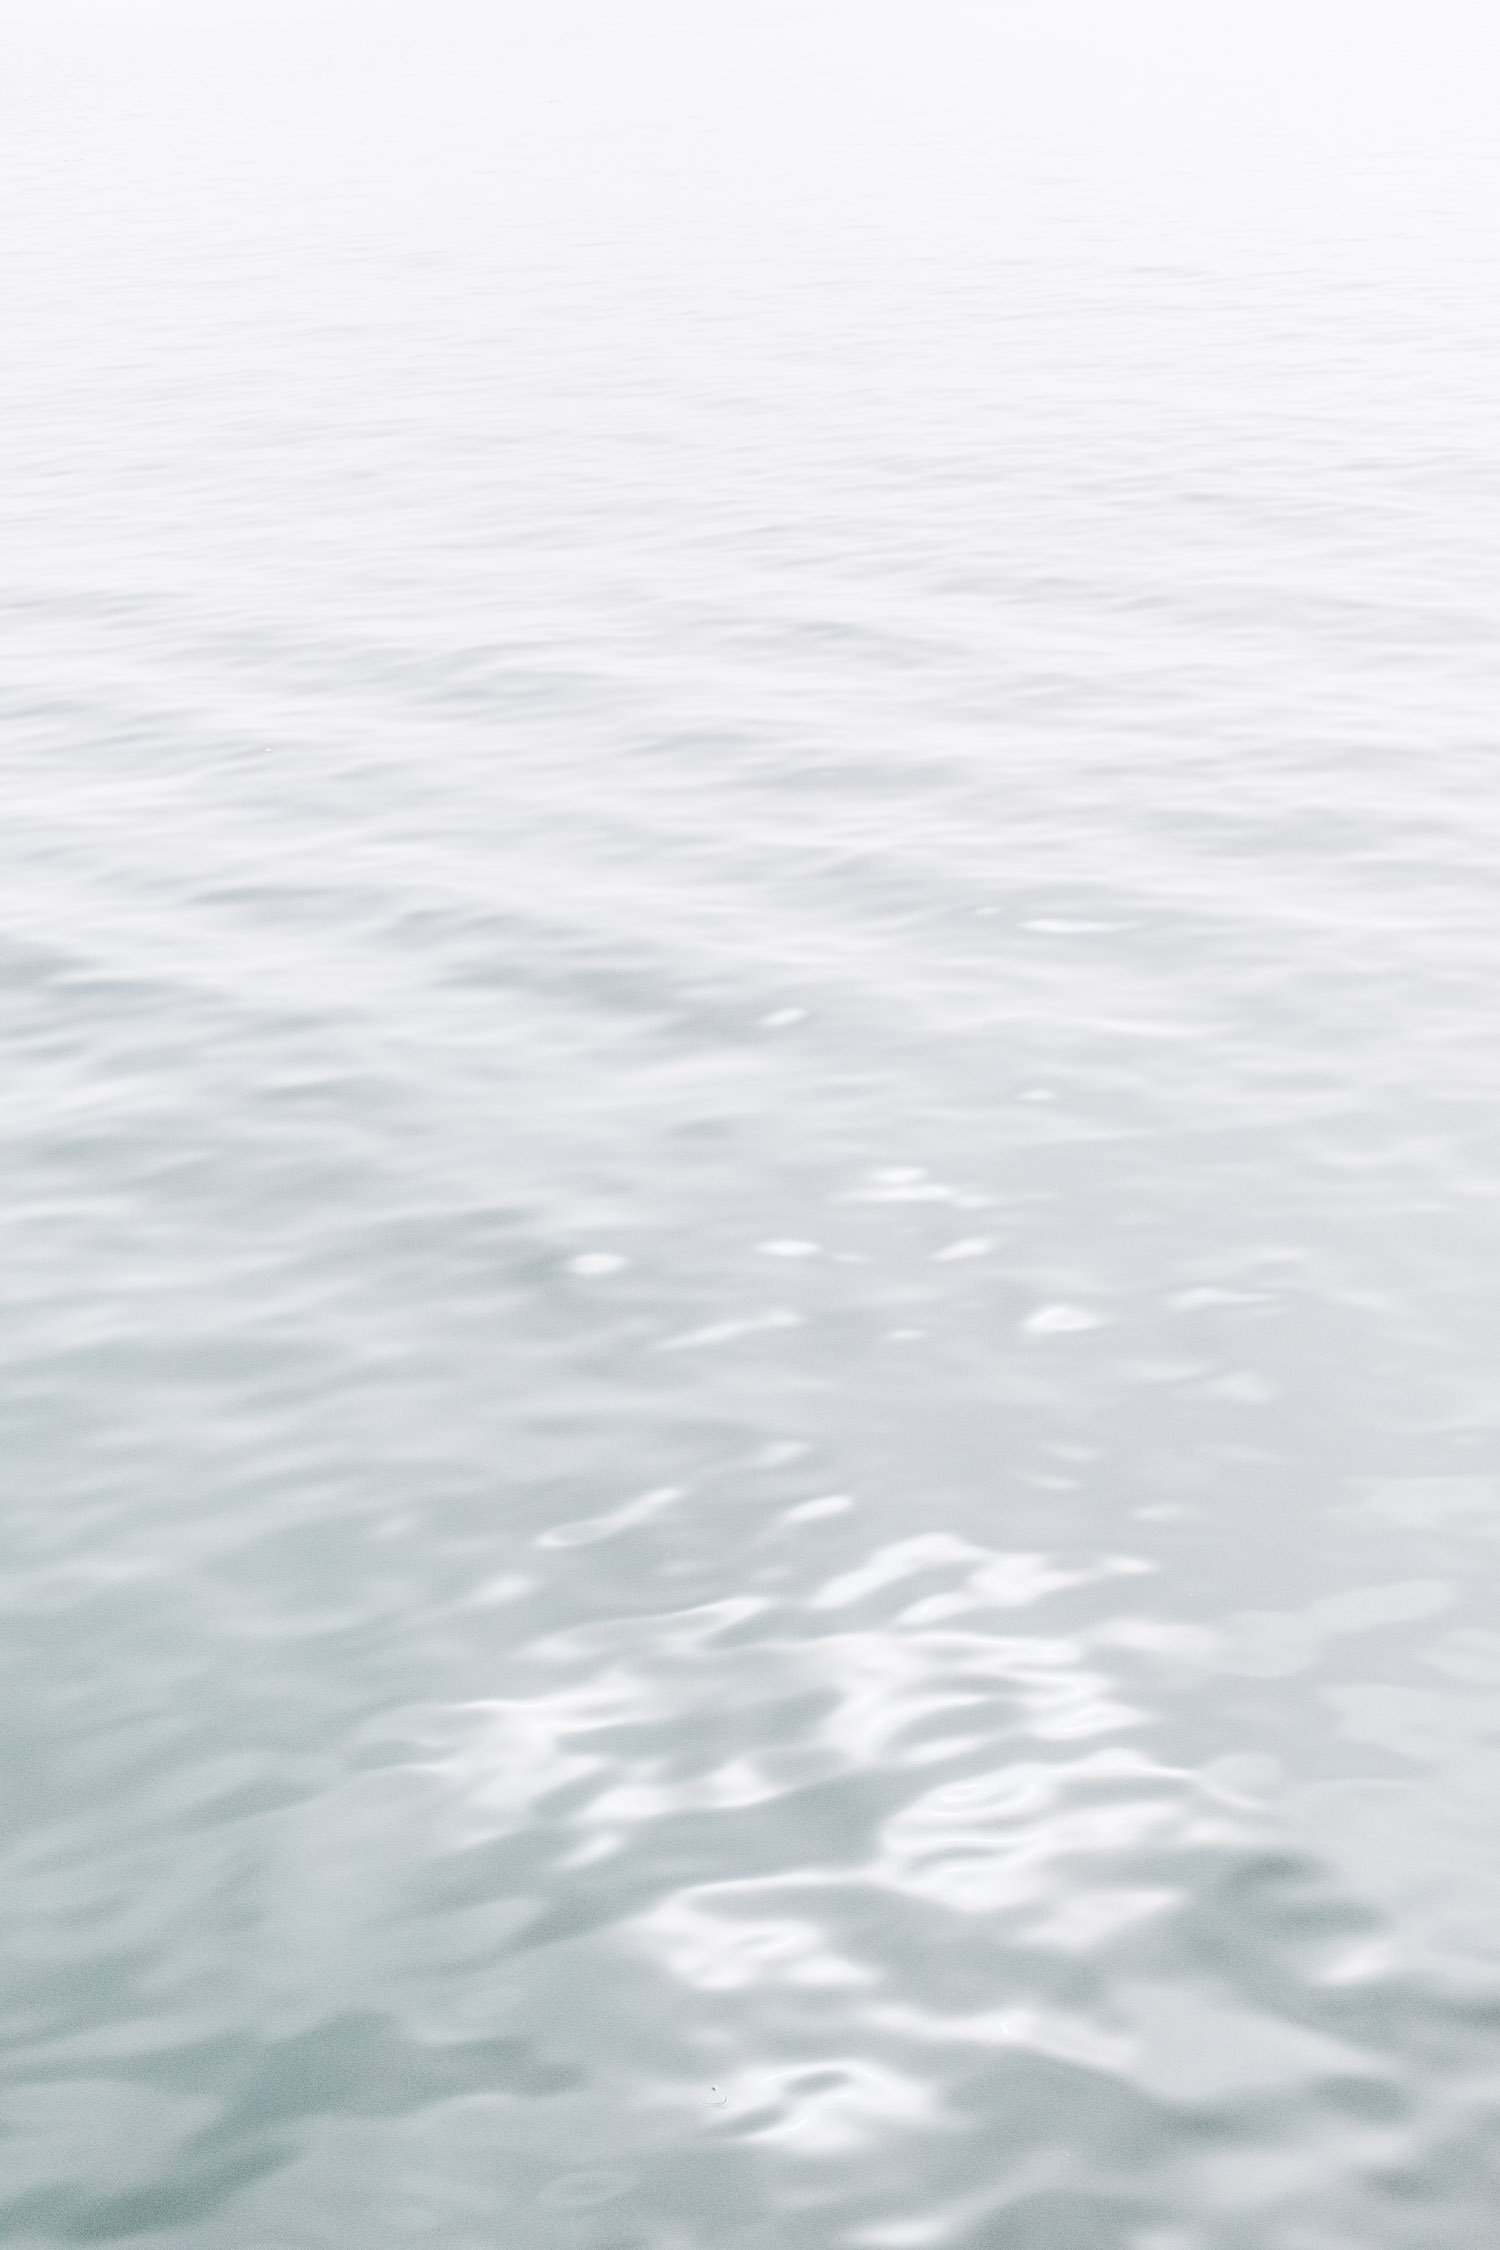 Malibu Ocean